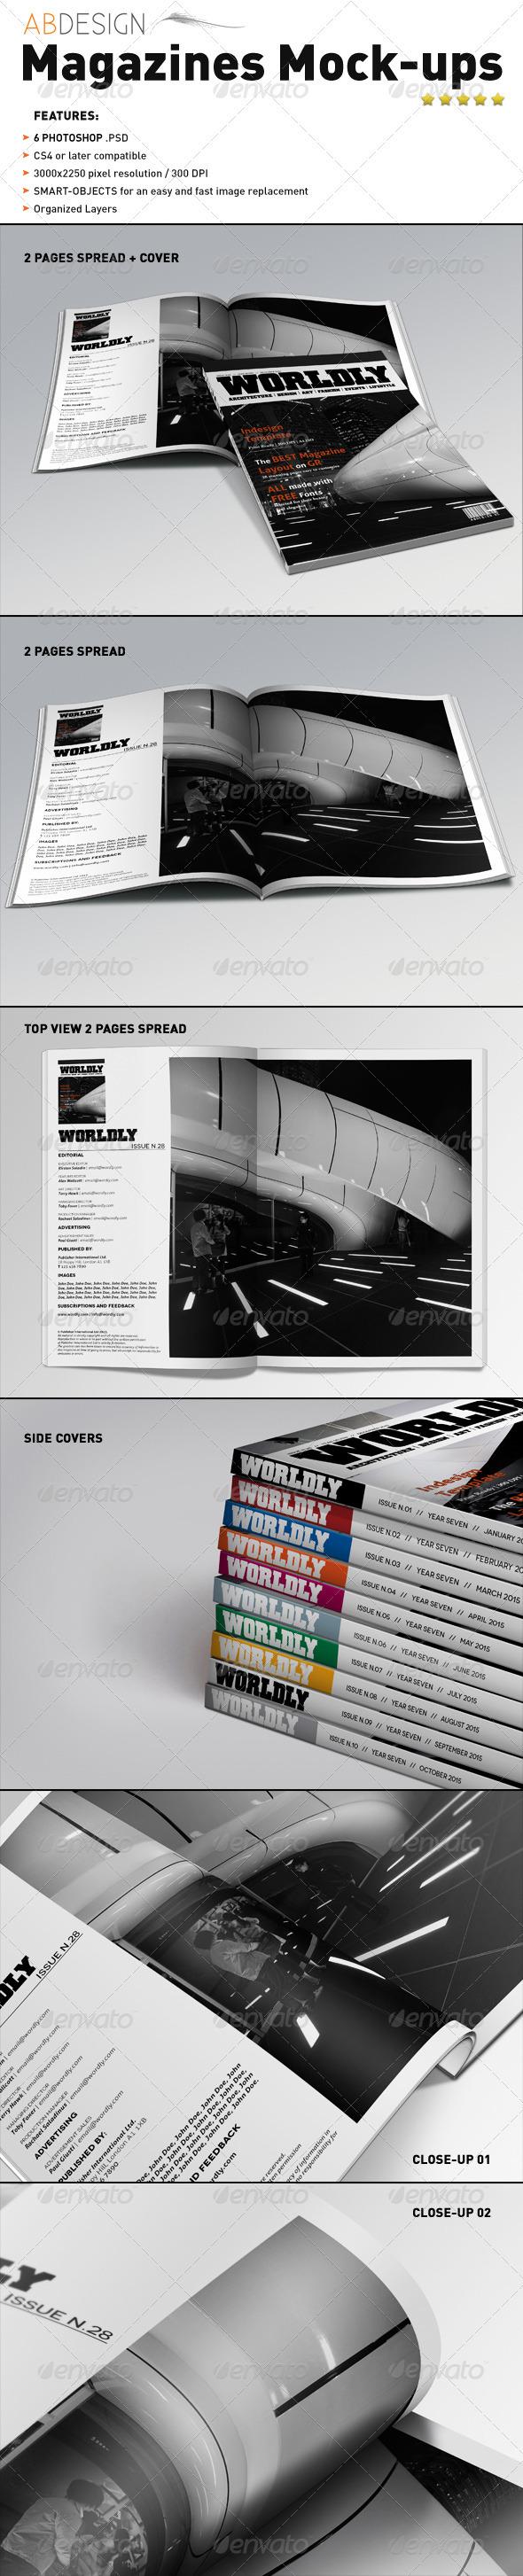 GraphicRiver Realistic Magazines Mock-ups Templates 1623692